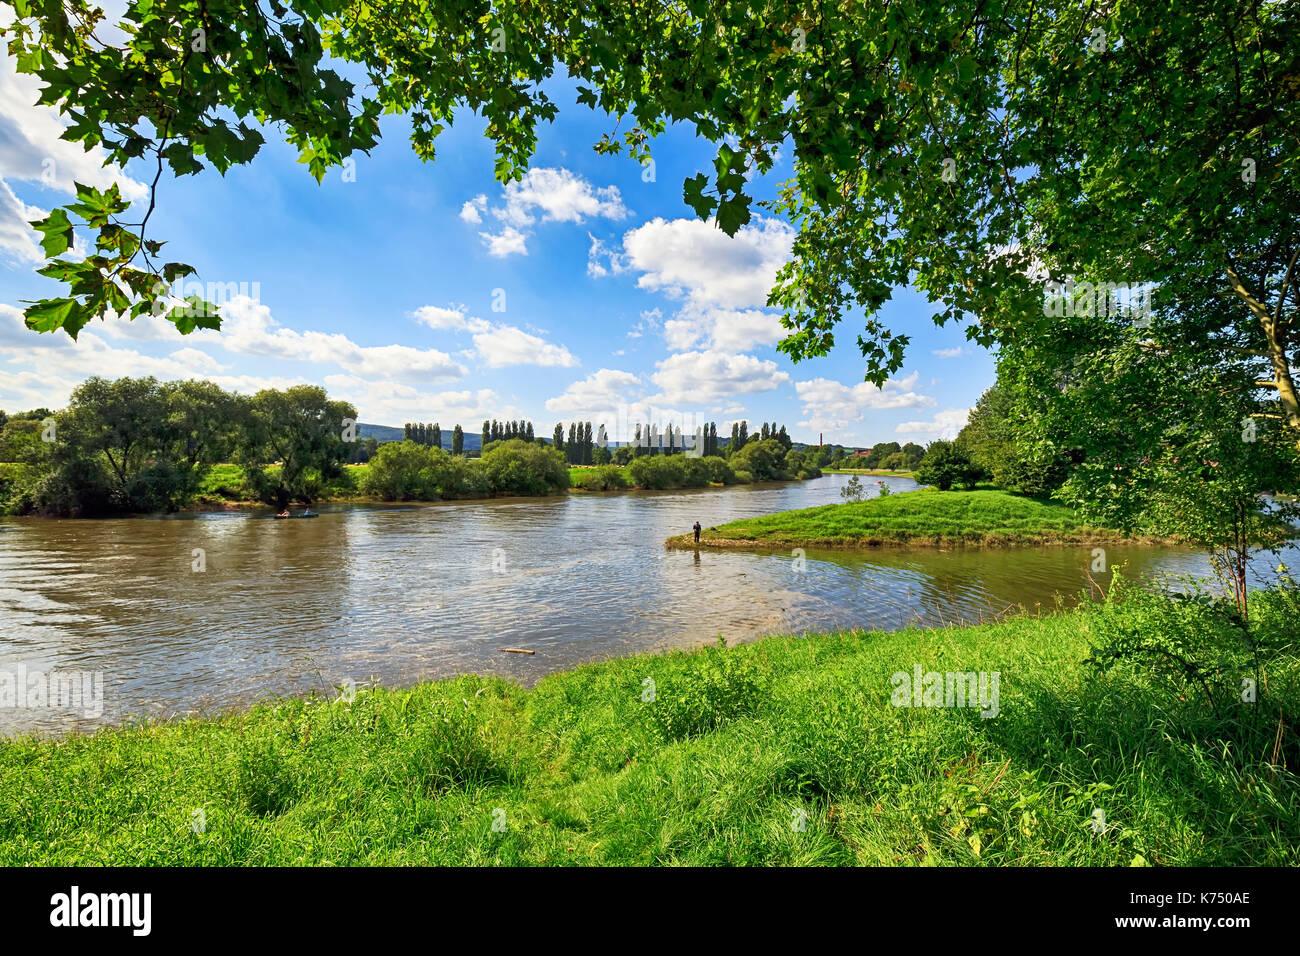 Weser near Höxter, Weserbergland, North Rhine-Westphalia, Germany - Stock Image